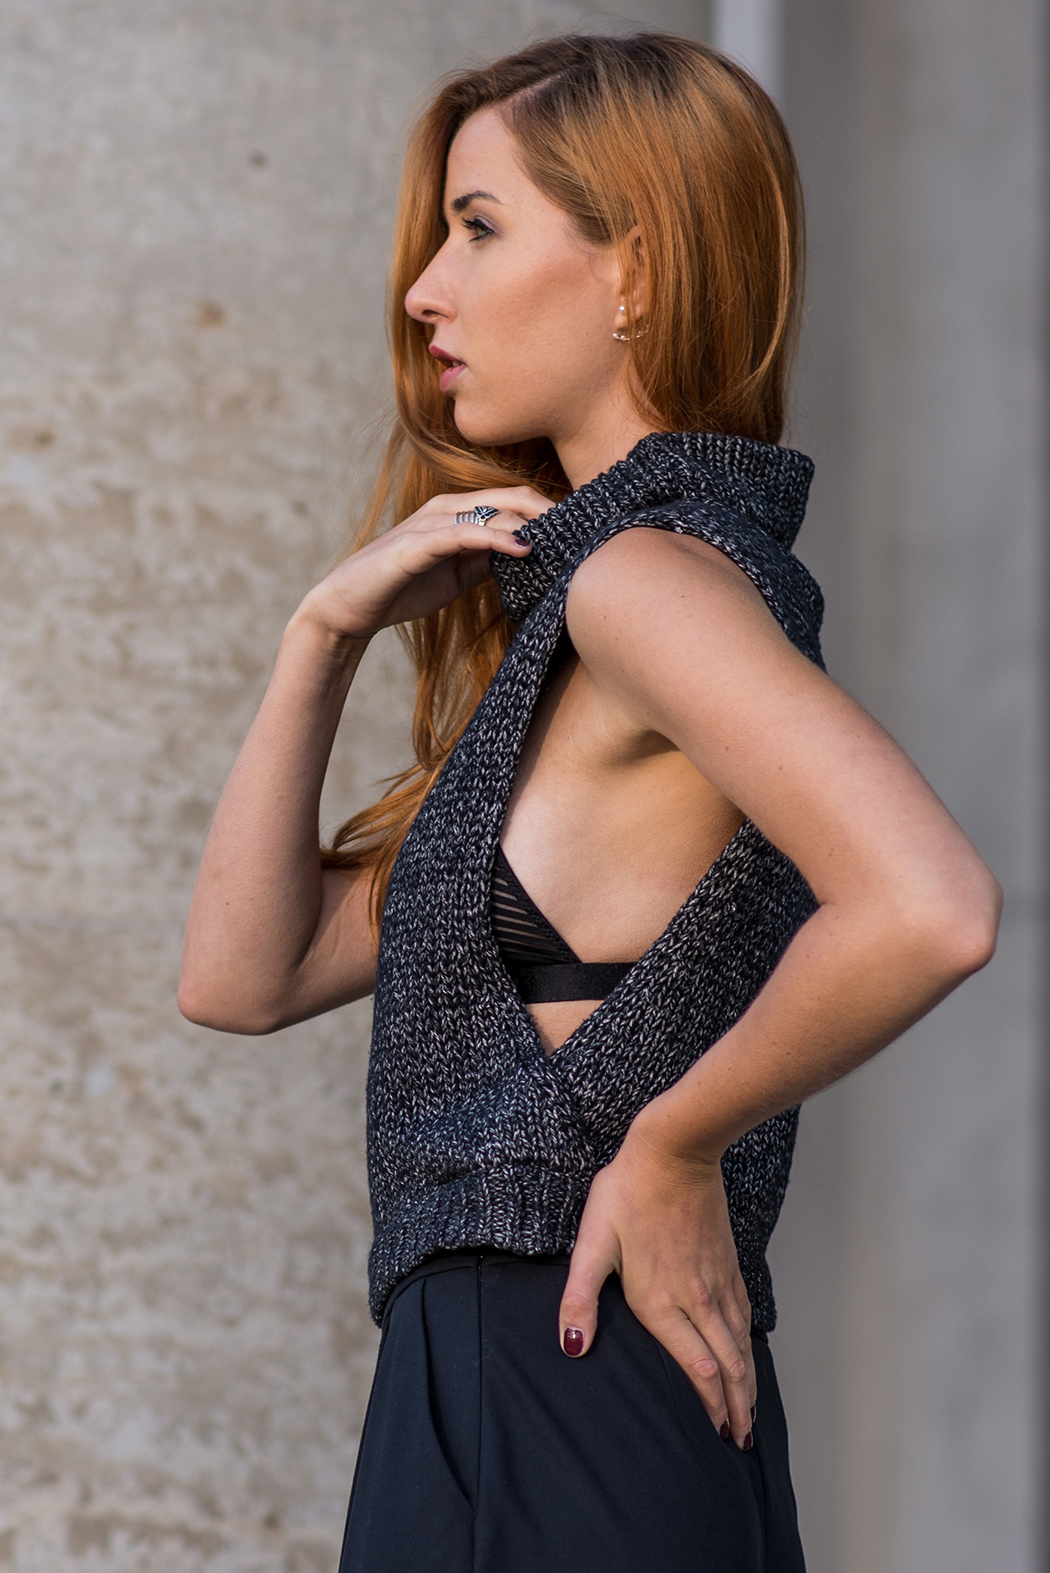 Fashionblog-Fashionblogger-München-Deutschland-Fashion-Blog-Lifestyle-Lindarella-Linda-Rella-Rollkragen-Pollunder-Strick-Palazzo-Hose-Louboutin-Heels-6-web